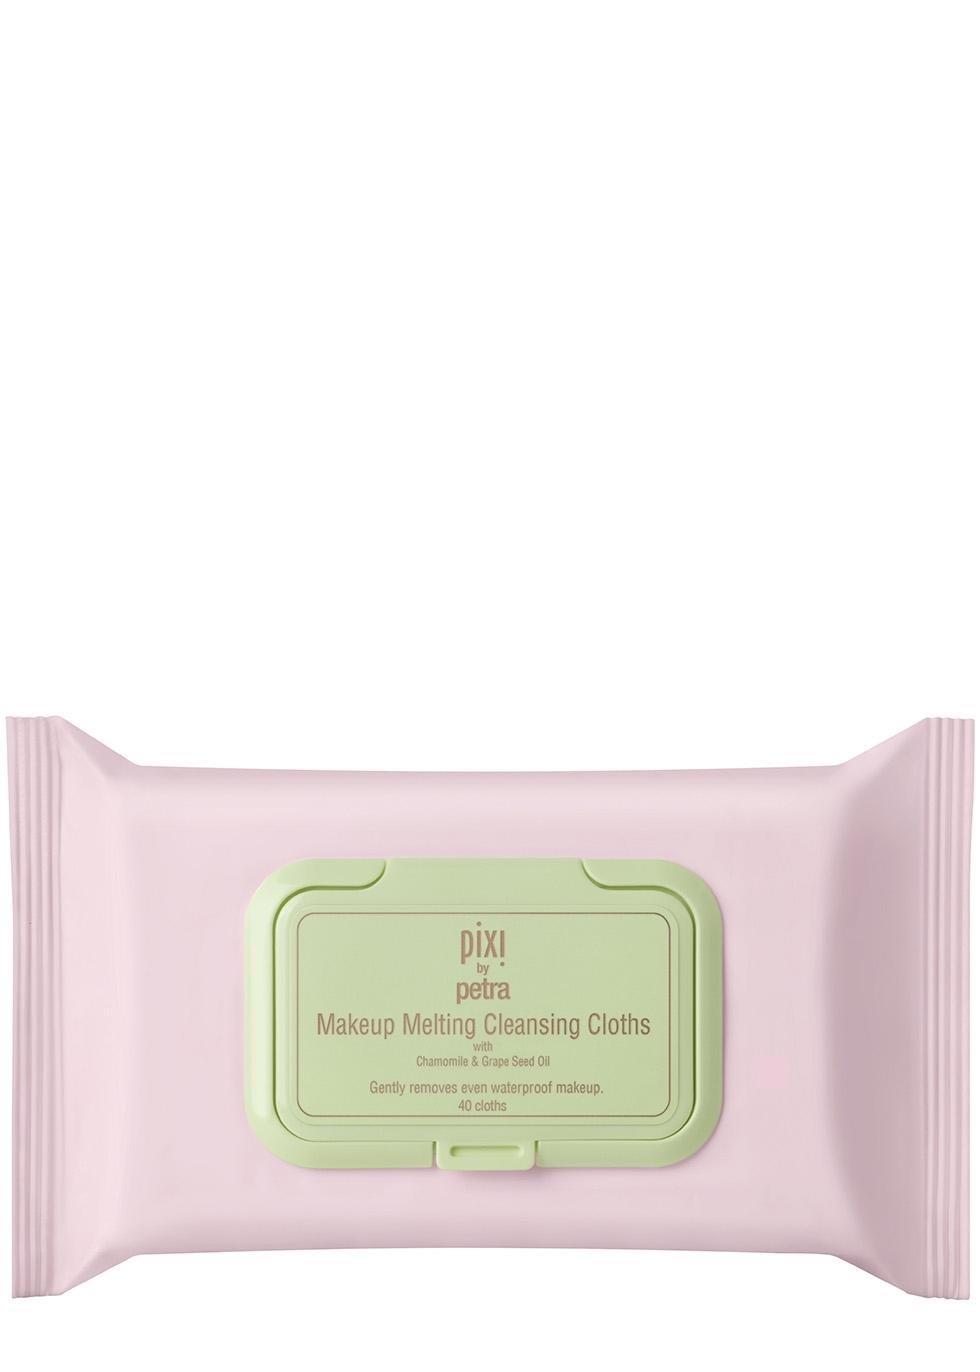 Luxury Body Beauty Products Harvey Nichols Walet Black Soap Original Box Diamond